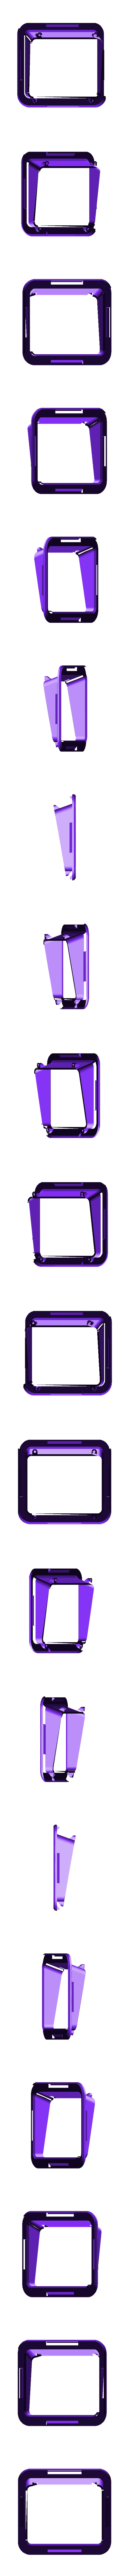 pytitano-ws-face-plate.stl Download free STL file ESP32 Retro Weather Station • 3D printer template, Adafruit